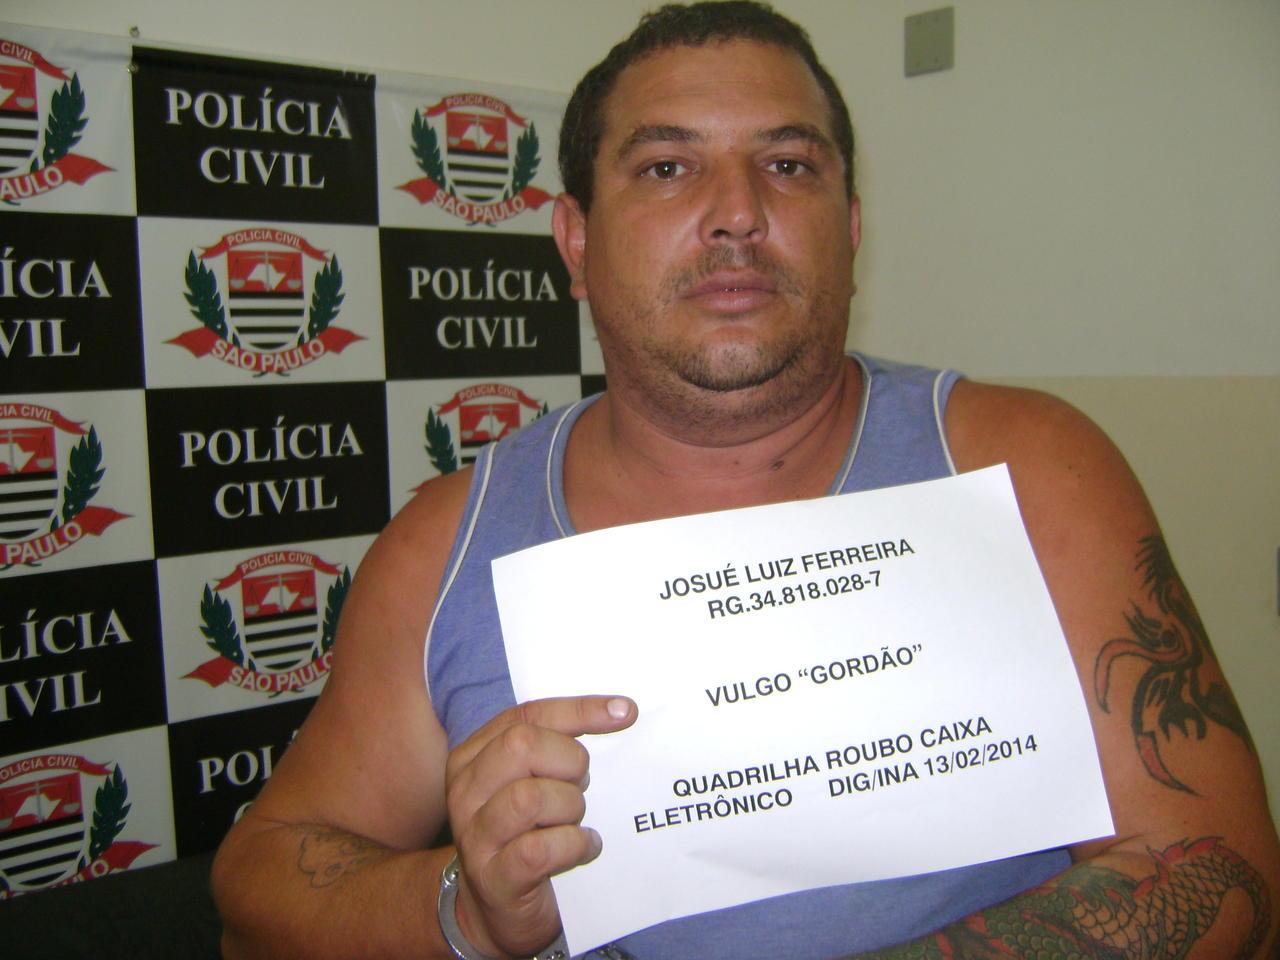 José Luiz Ferreira - ADIVAL B. PINTO